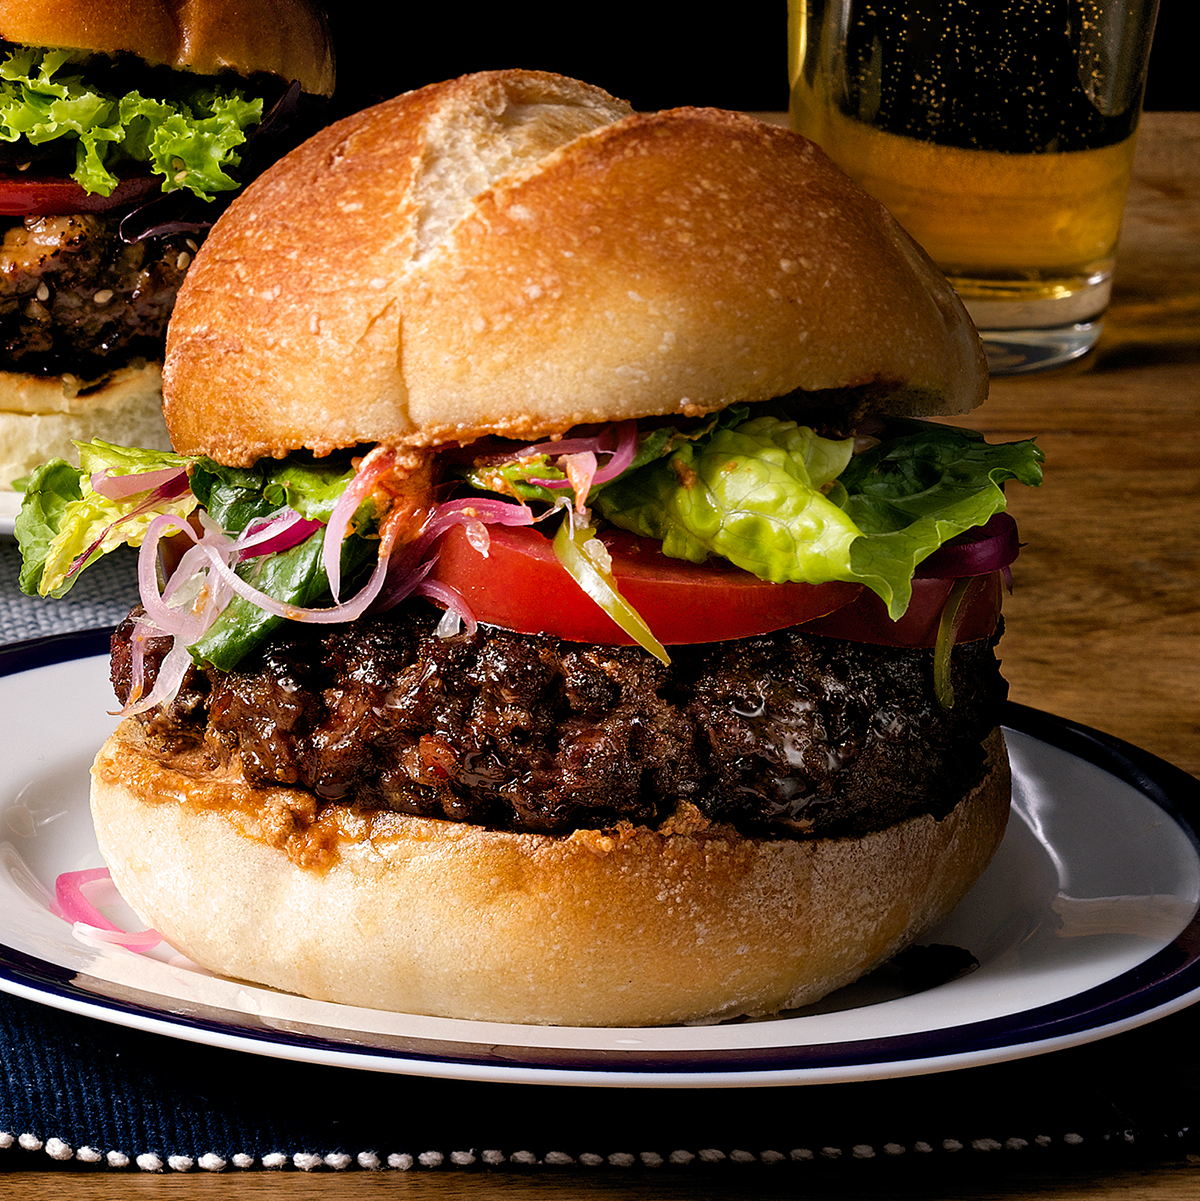 sur burger on plate